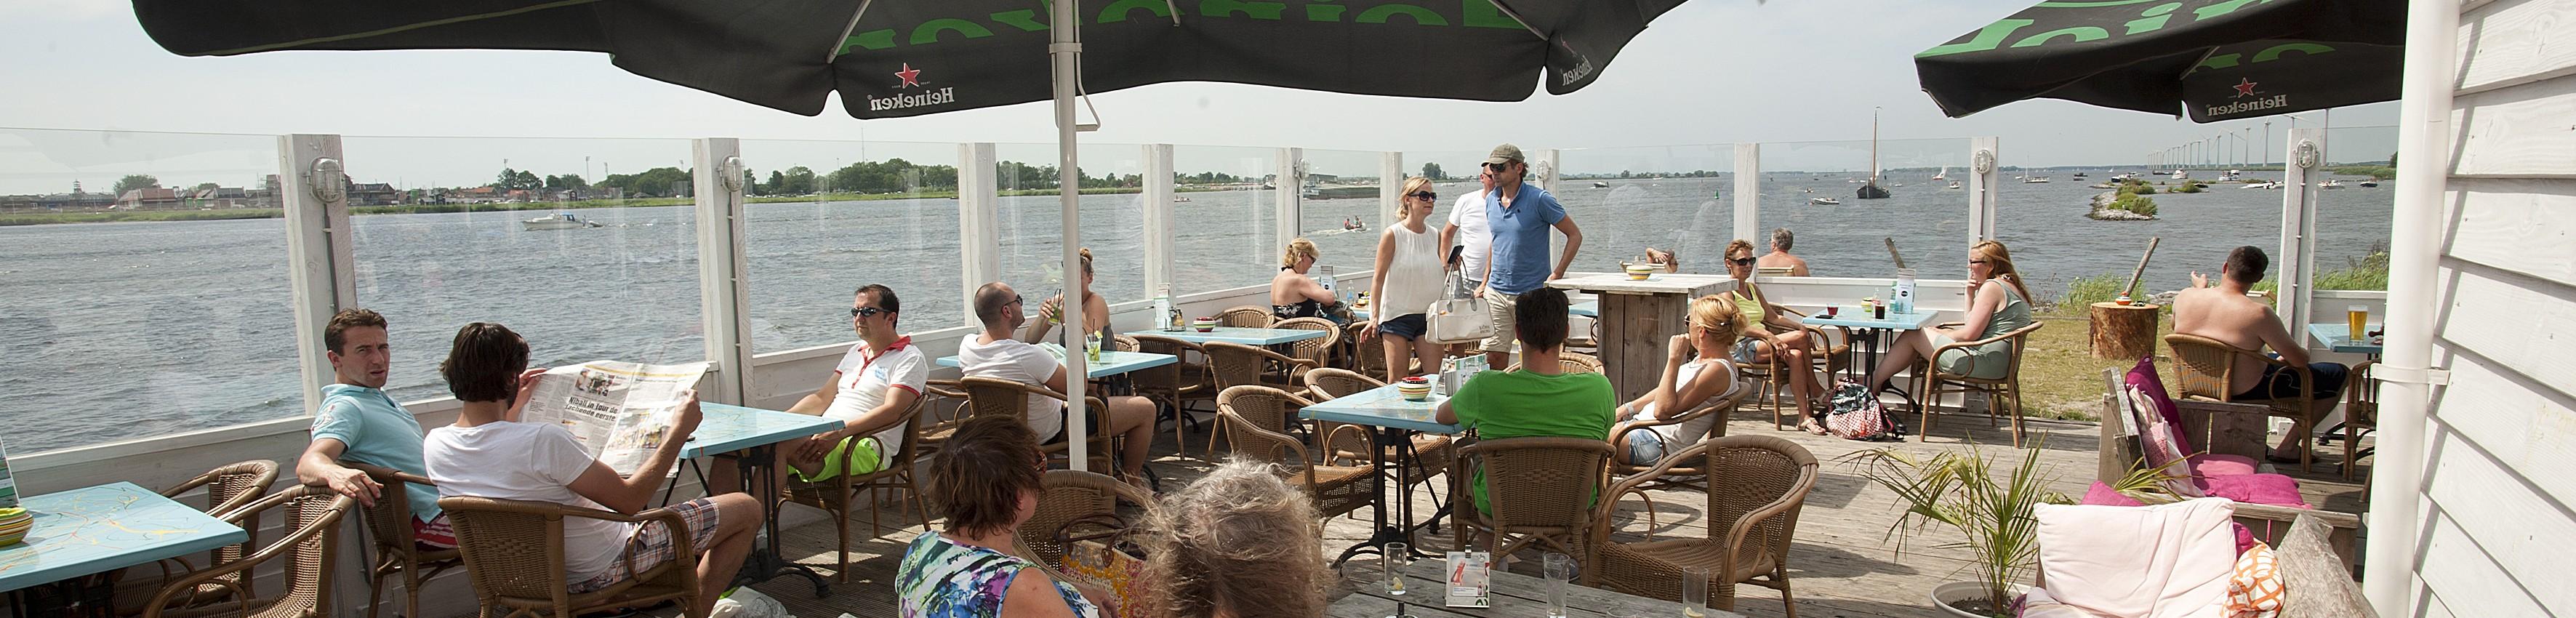 Beachclub Zeewolde   Eemhof Watersport & Beachclub